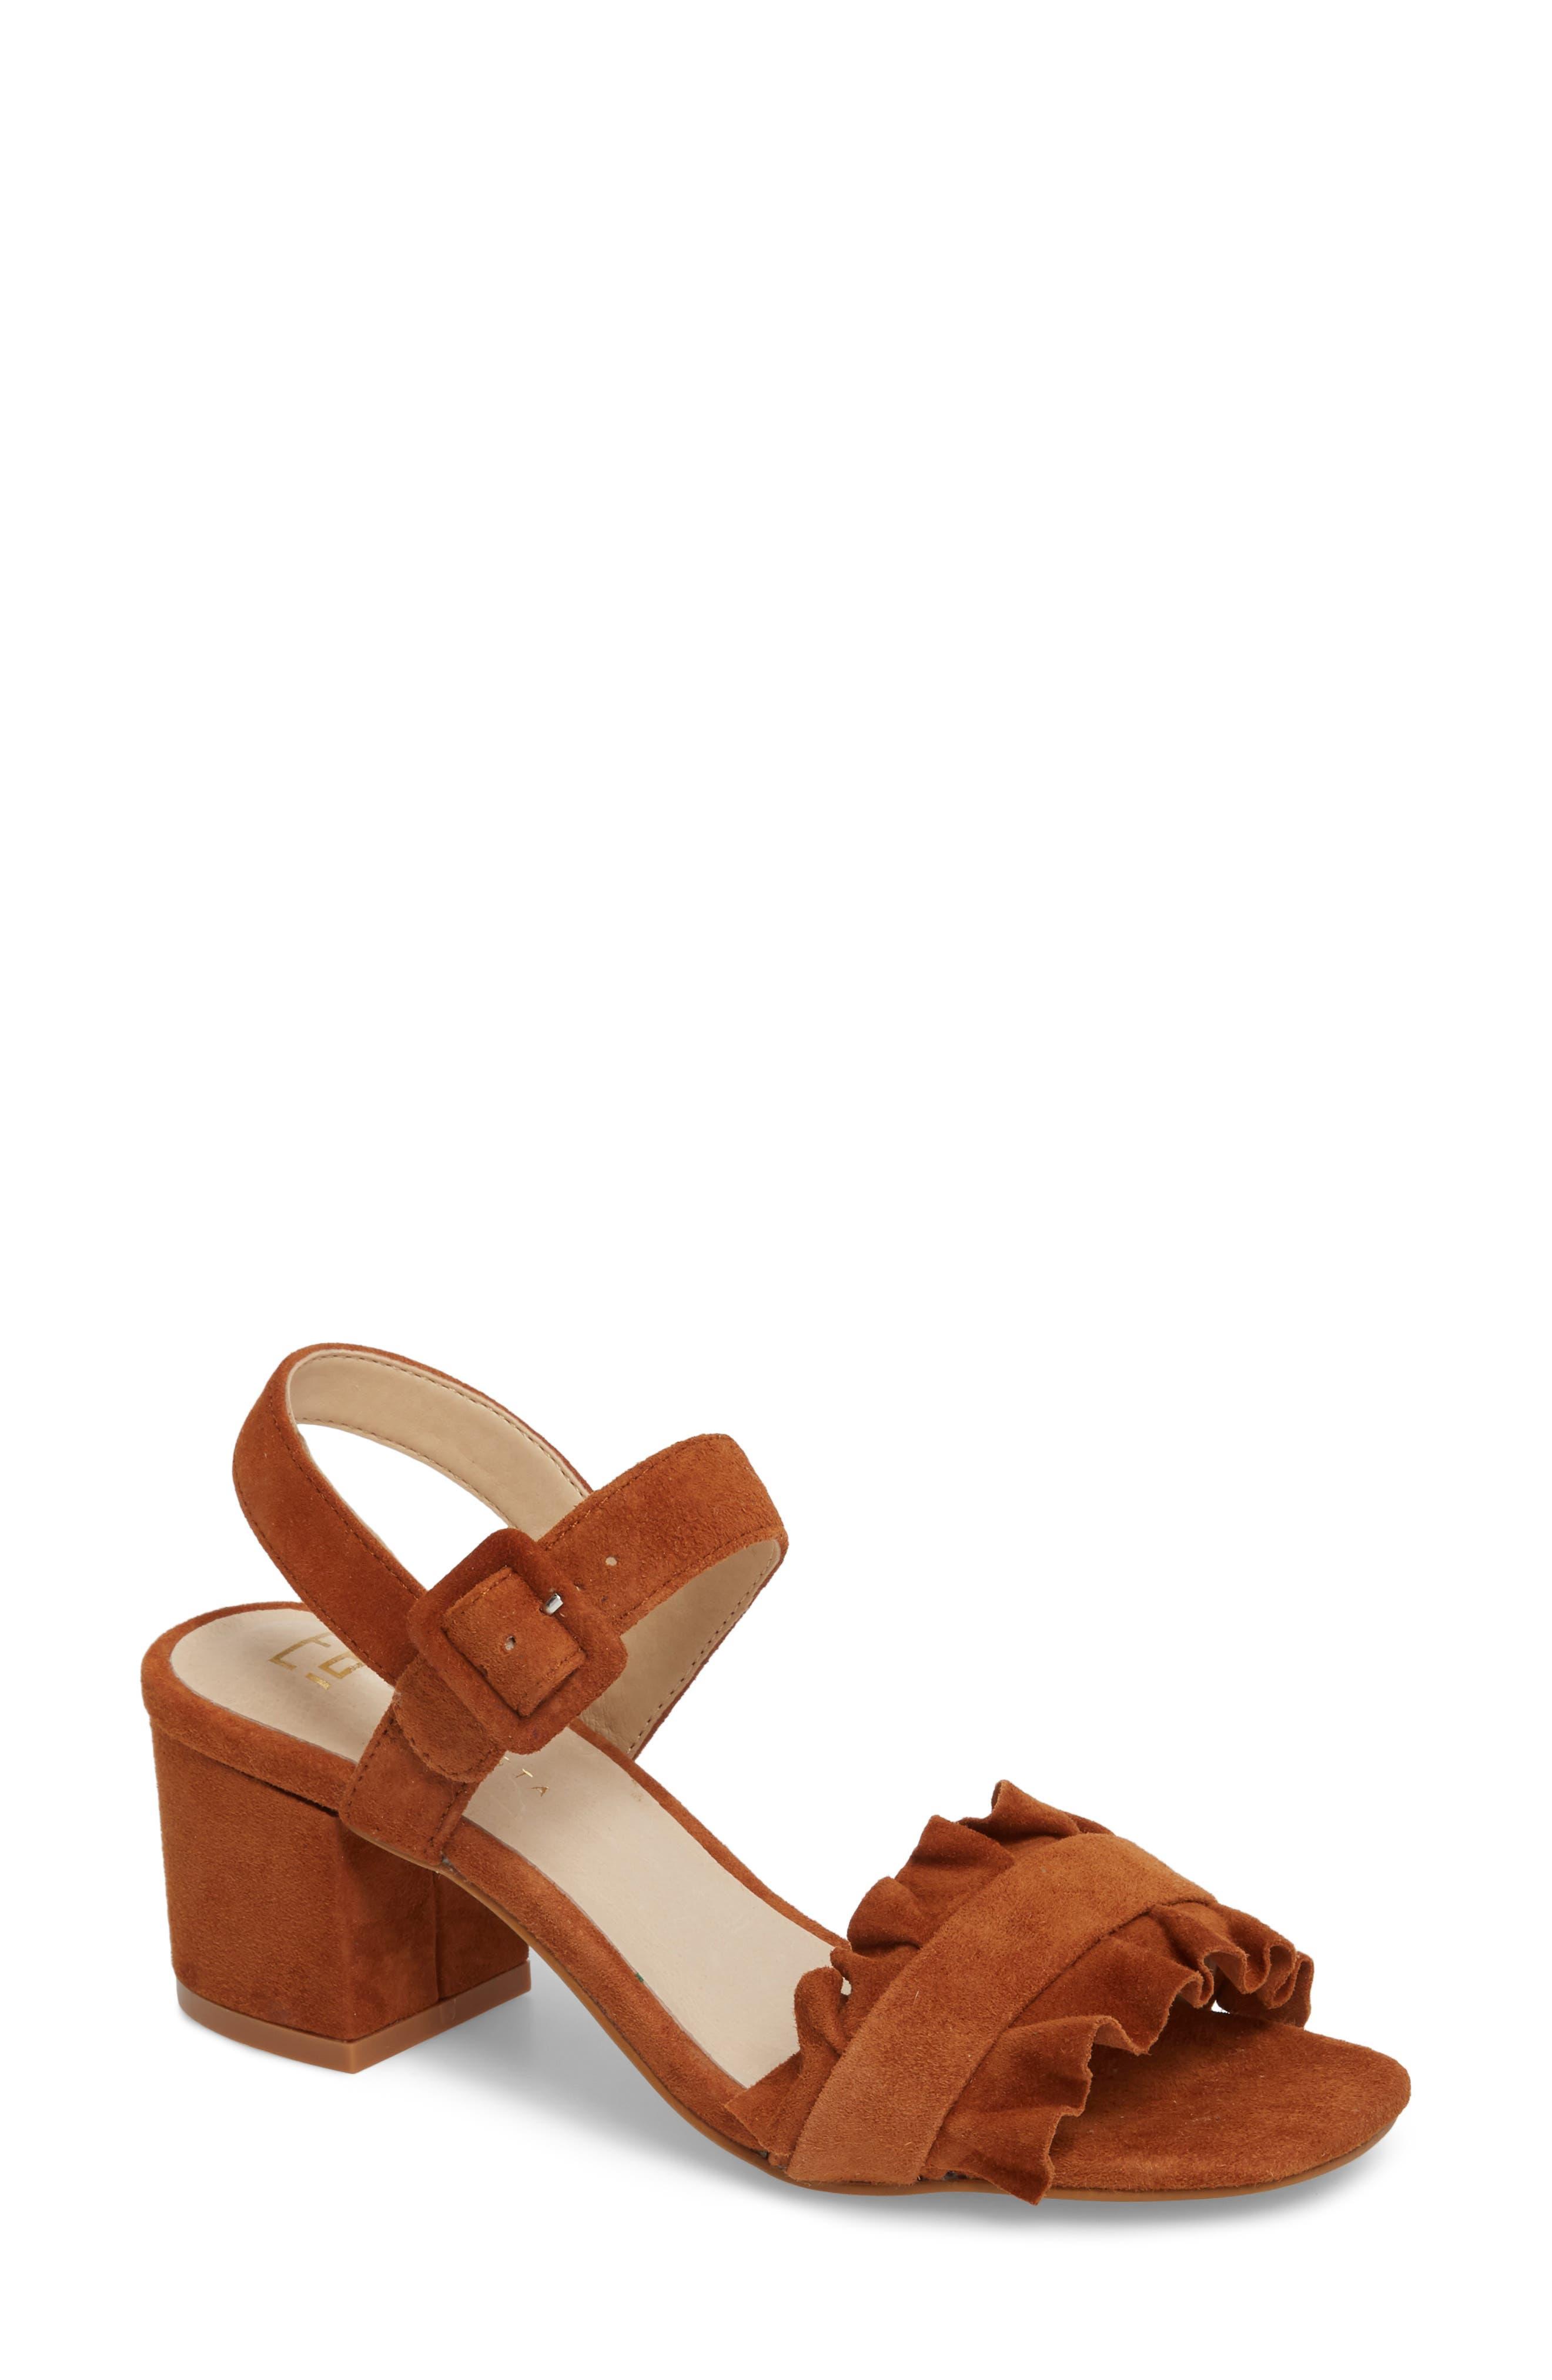 E8 By Miista Sandie Block Heel Sandal